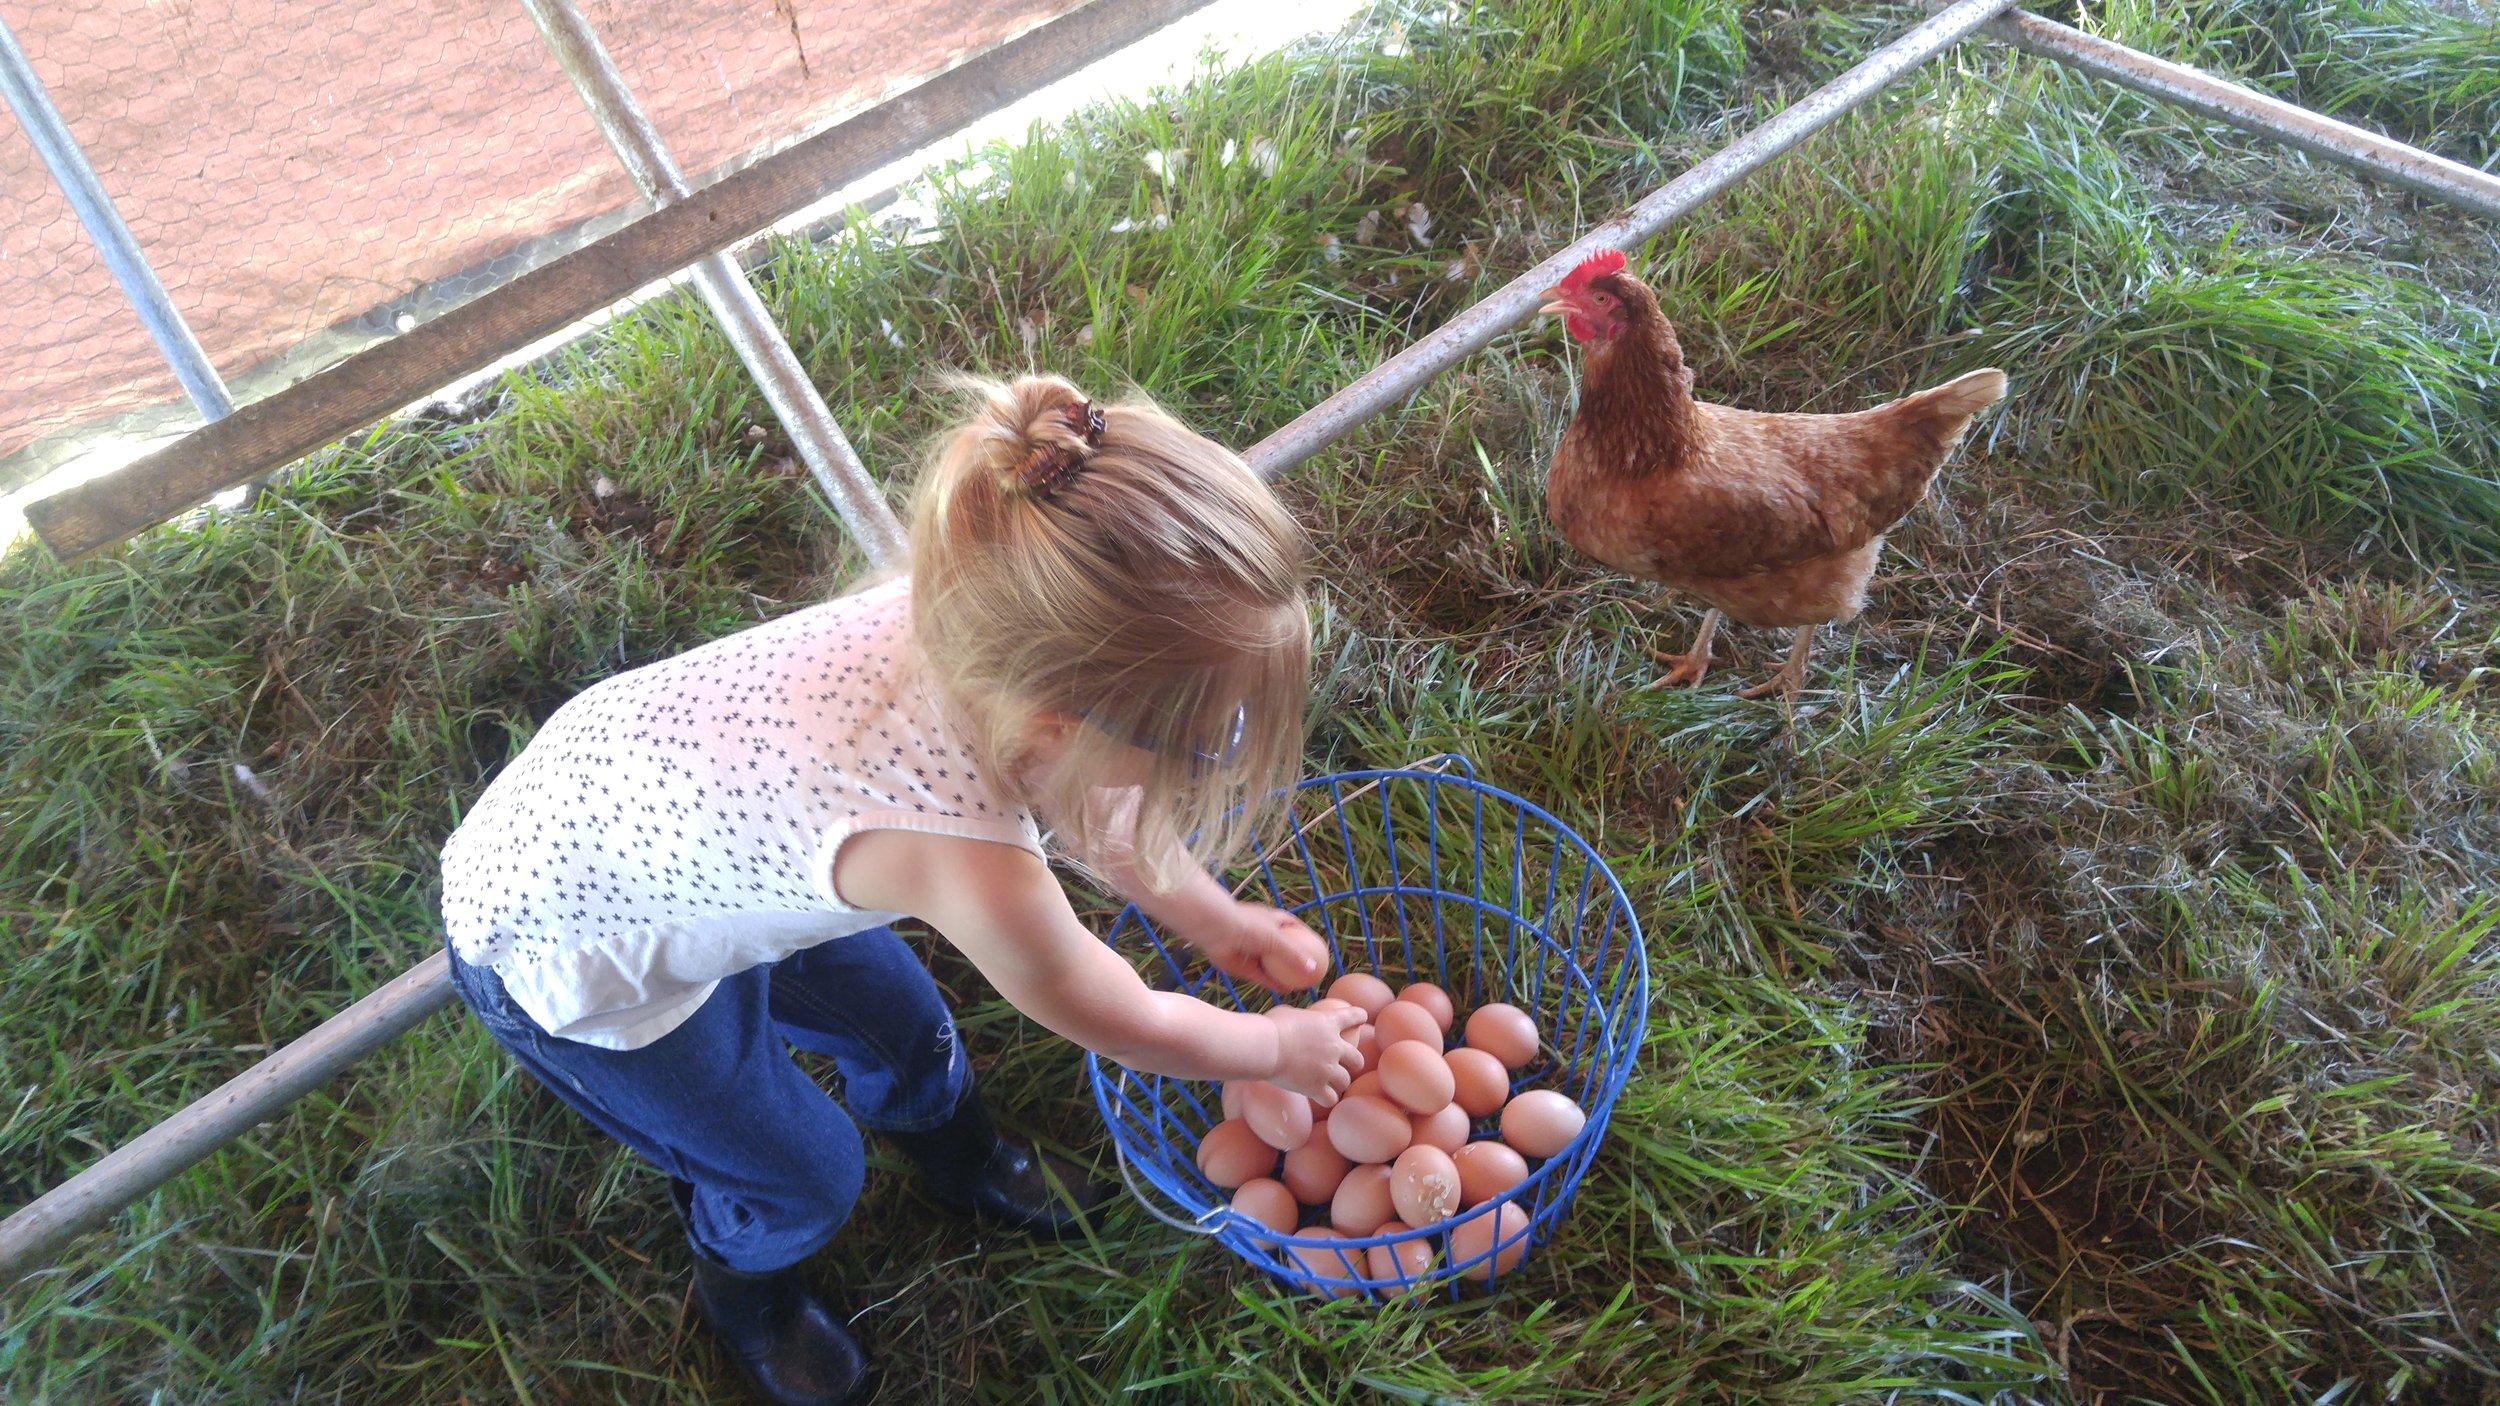 Our daughter Fallon collecting eggs.